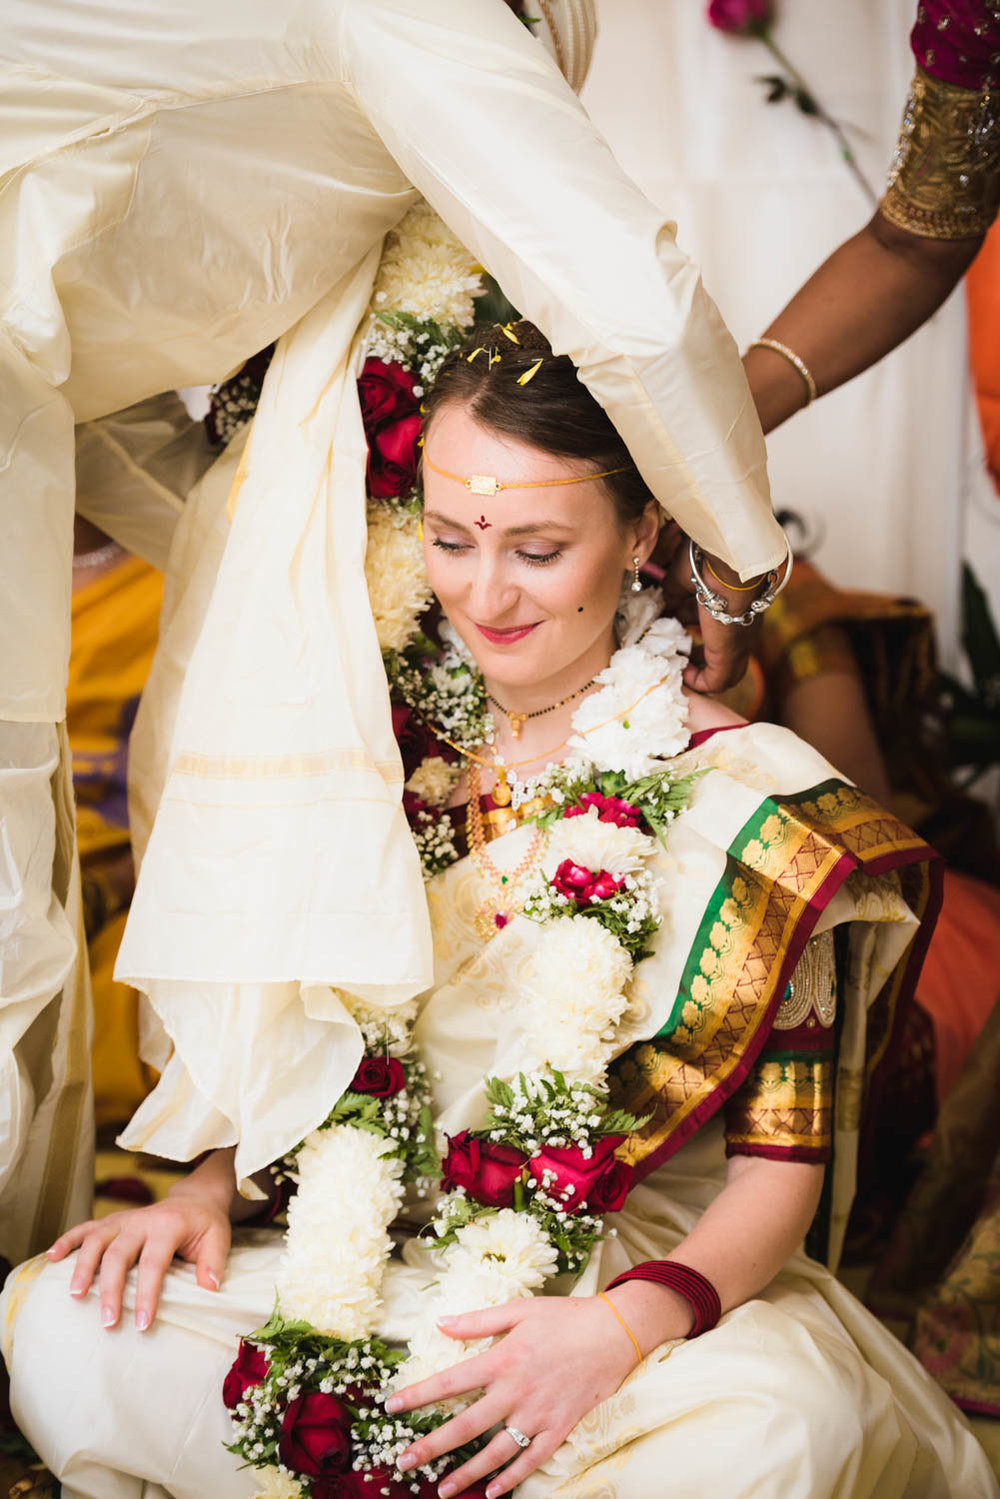 ecaterina-chandu-indian-wedding23.jpg